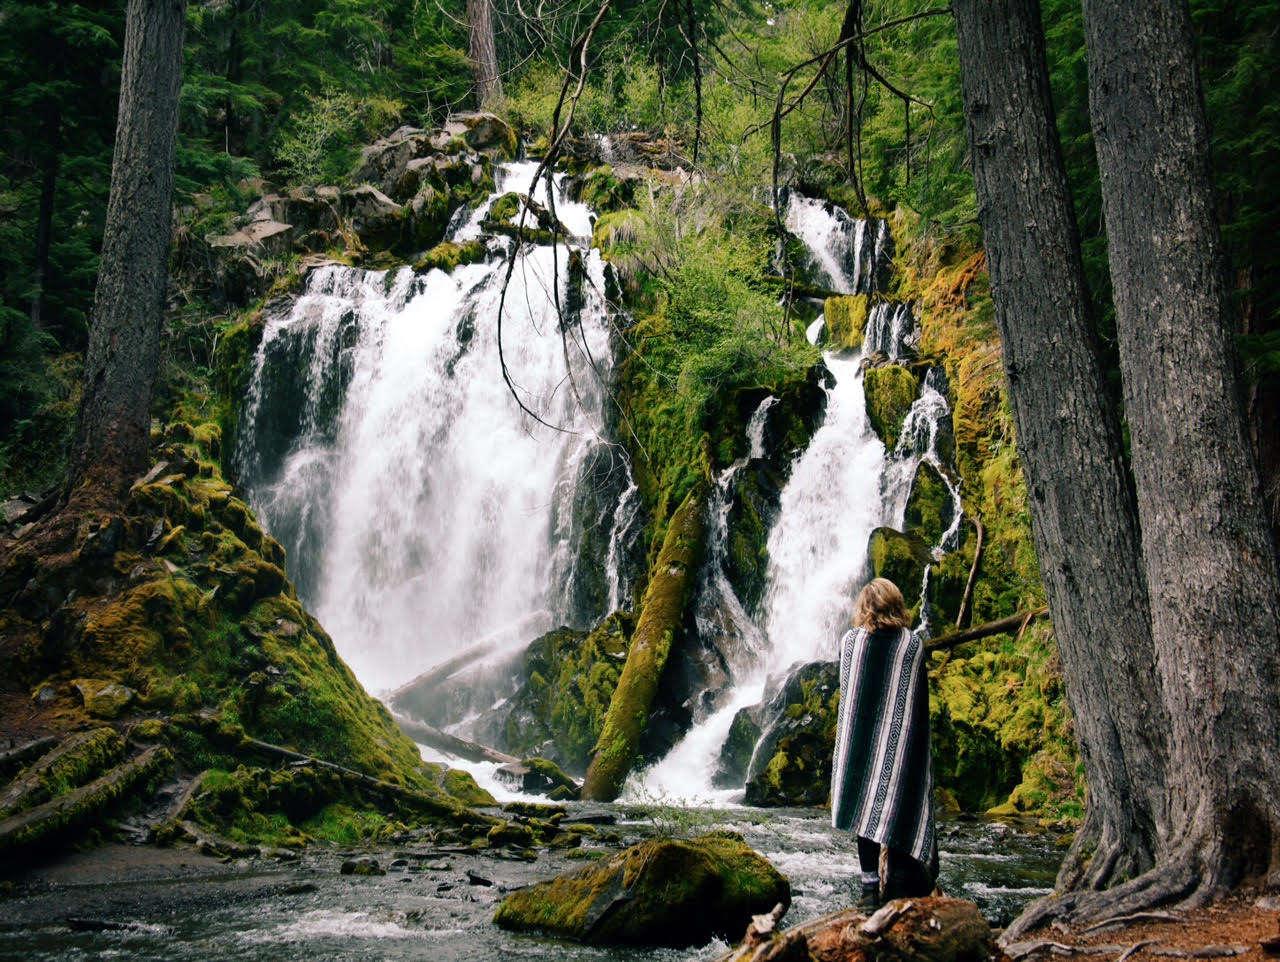 Hamaker Campground Rogue River Siskiyou Or 3 Photos